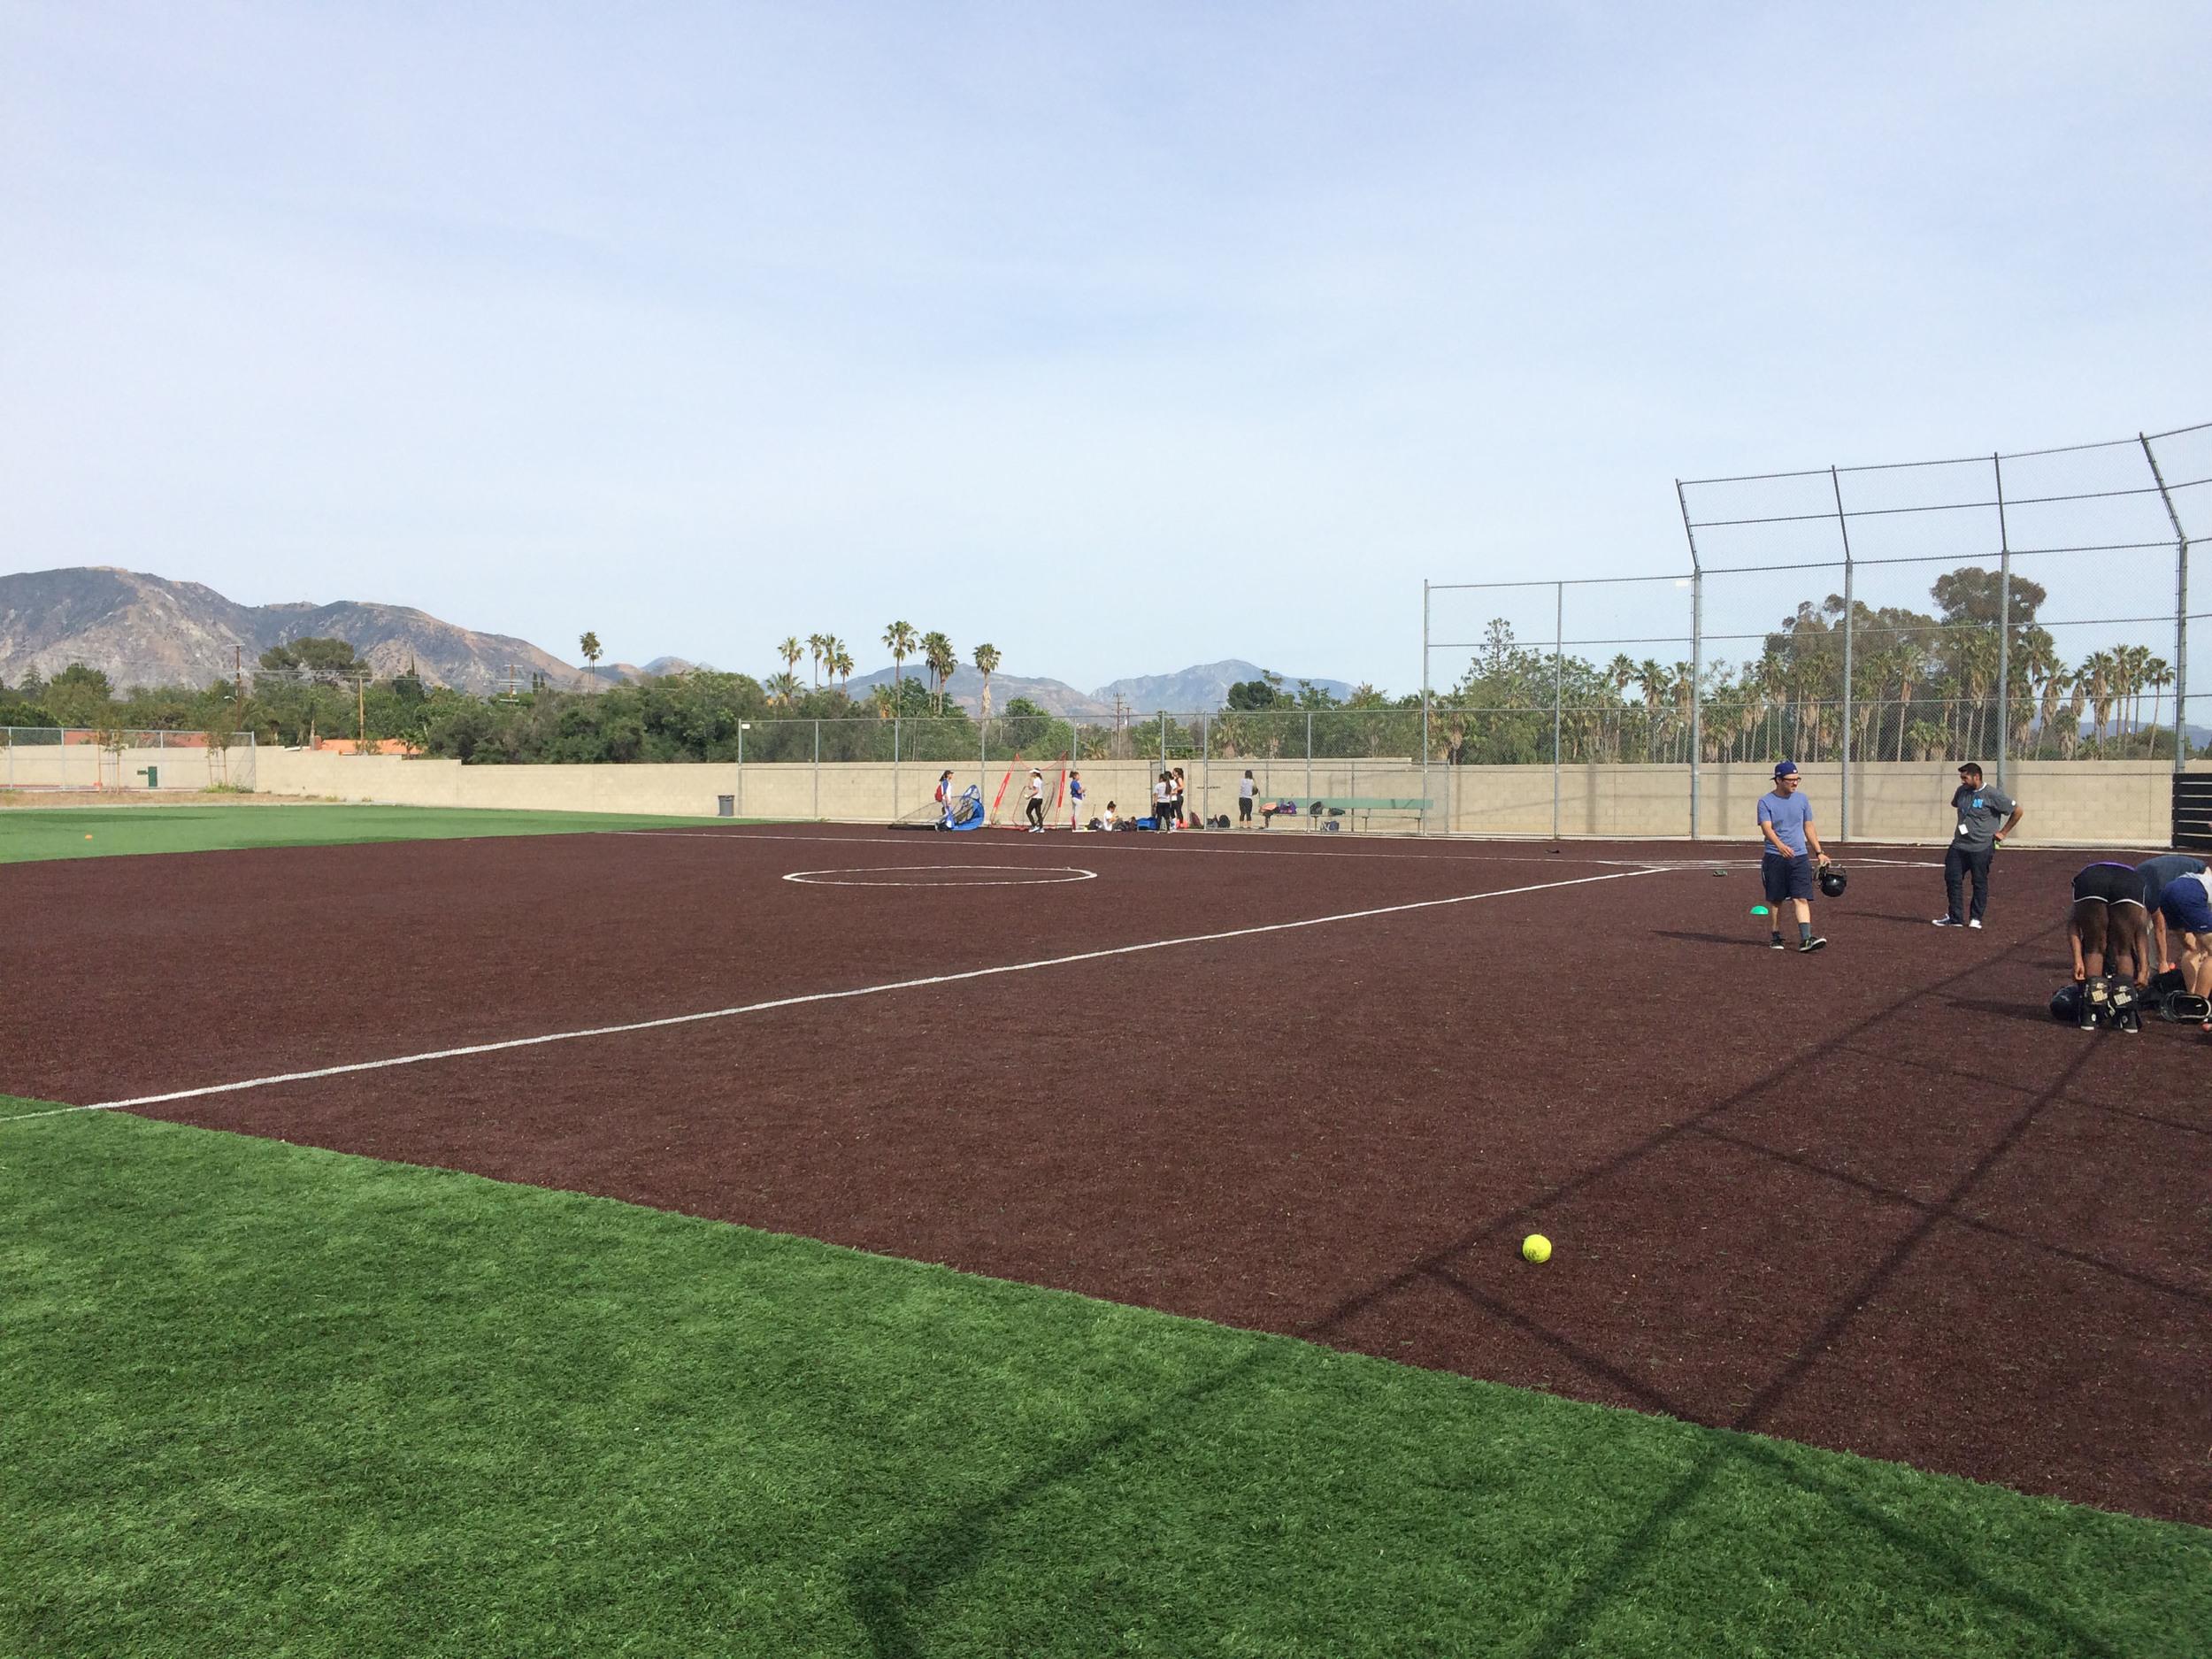 Synthetic artificial grass baseball field